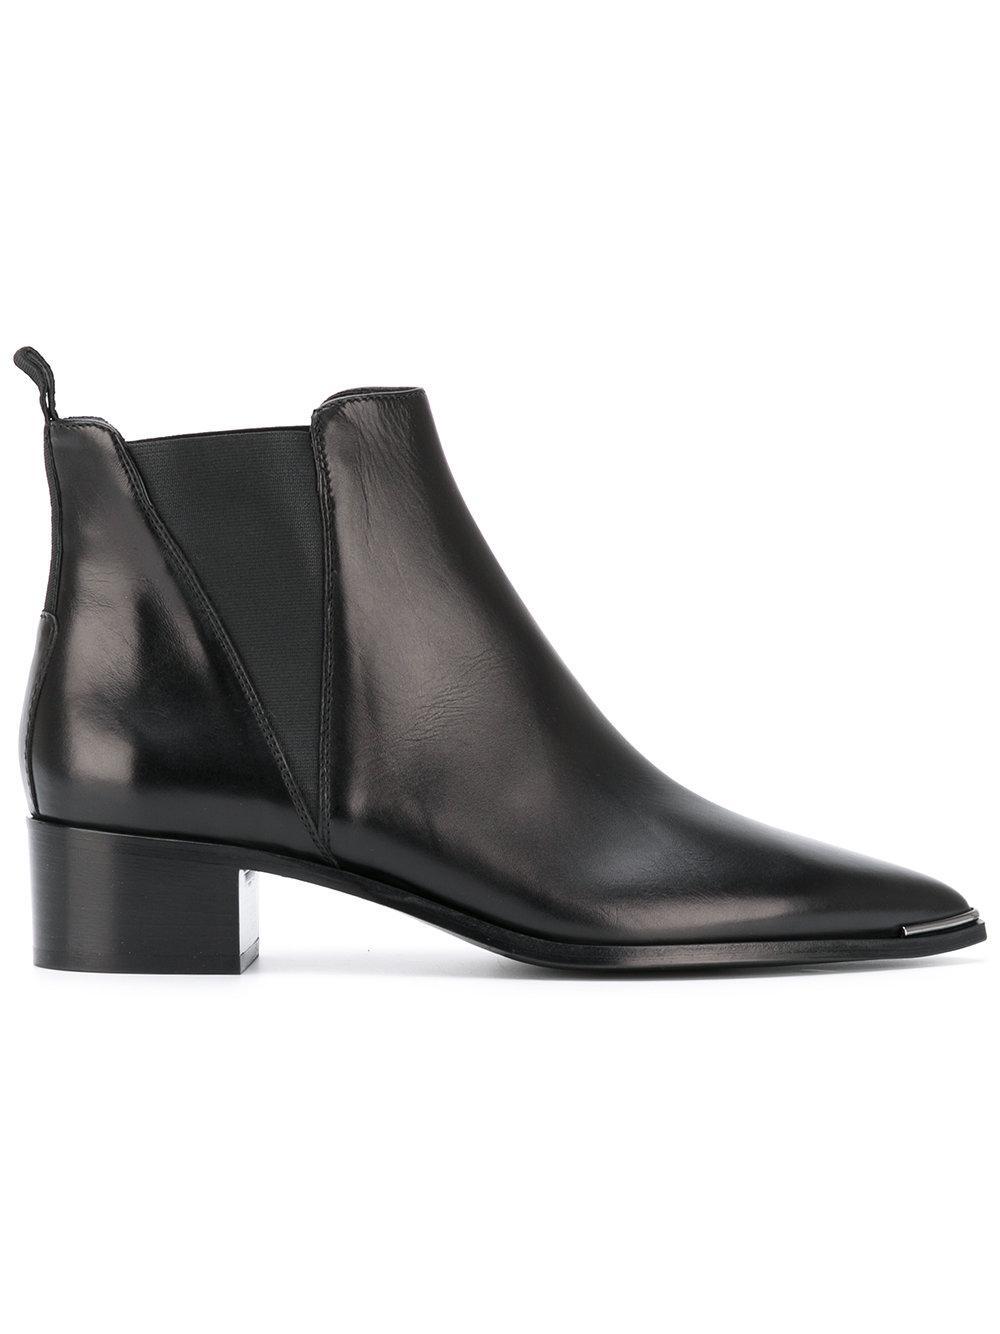 acne studios 39 jensen 39 chelsea boots women calf. Black Bedroom Furniture Sets. Home Design Ideas